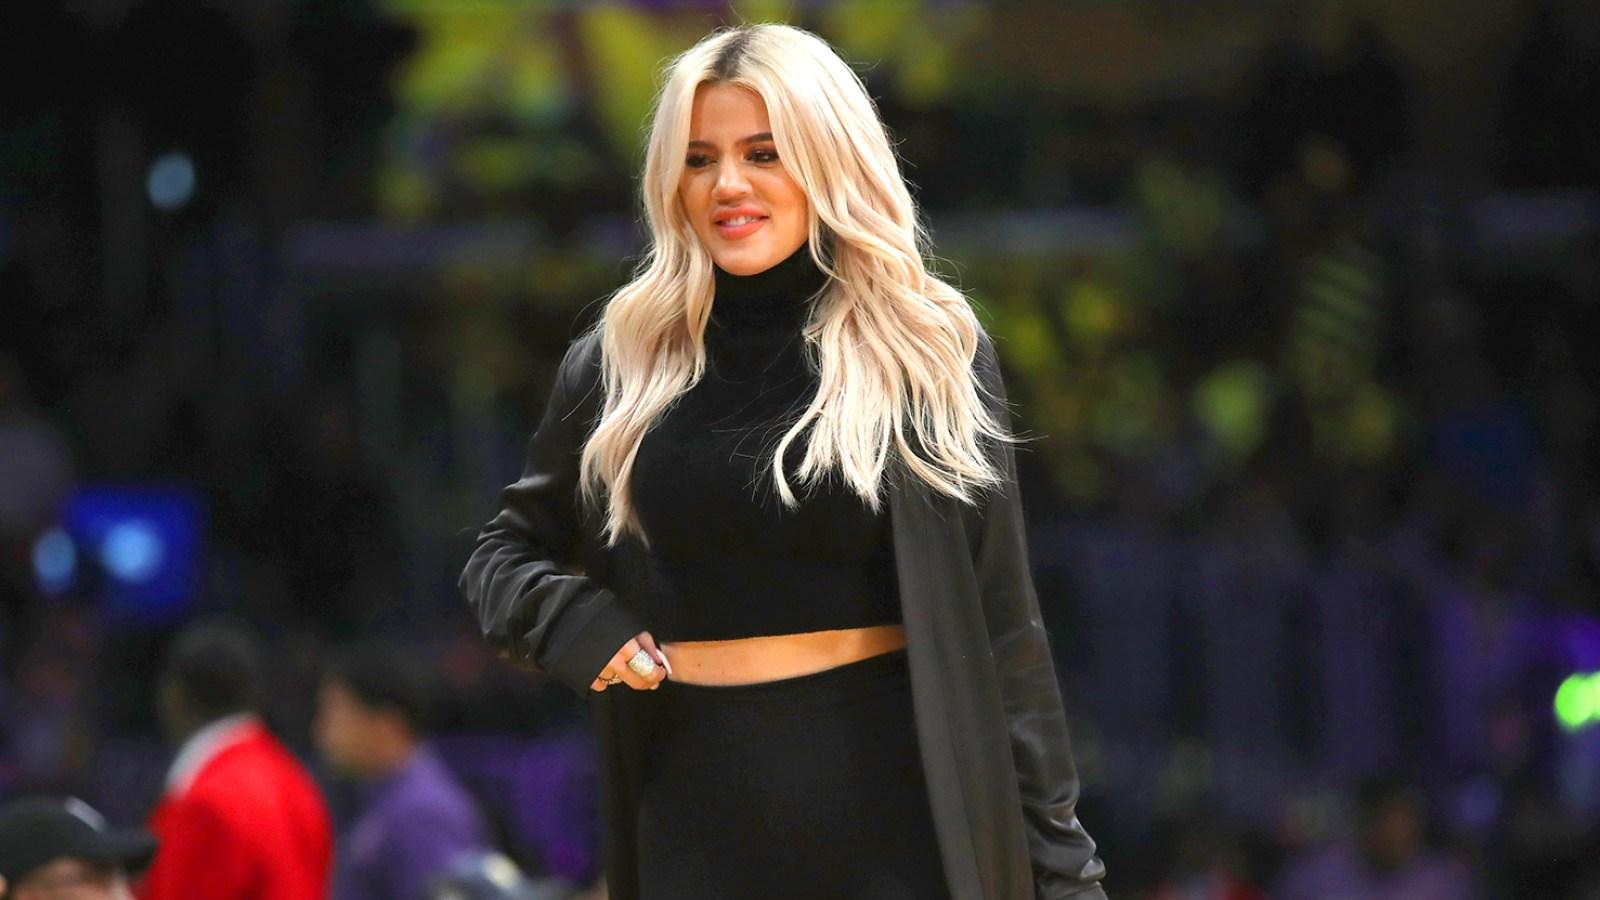 """kuwk-khloe-kardashian-backtracks-after-teamjordyn-trends-for-24-hours-jordyn-is-not-to-be-blamed-for-the-breakup-of-my-family"""